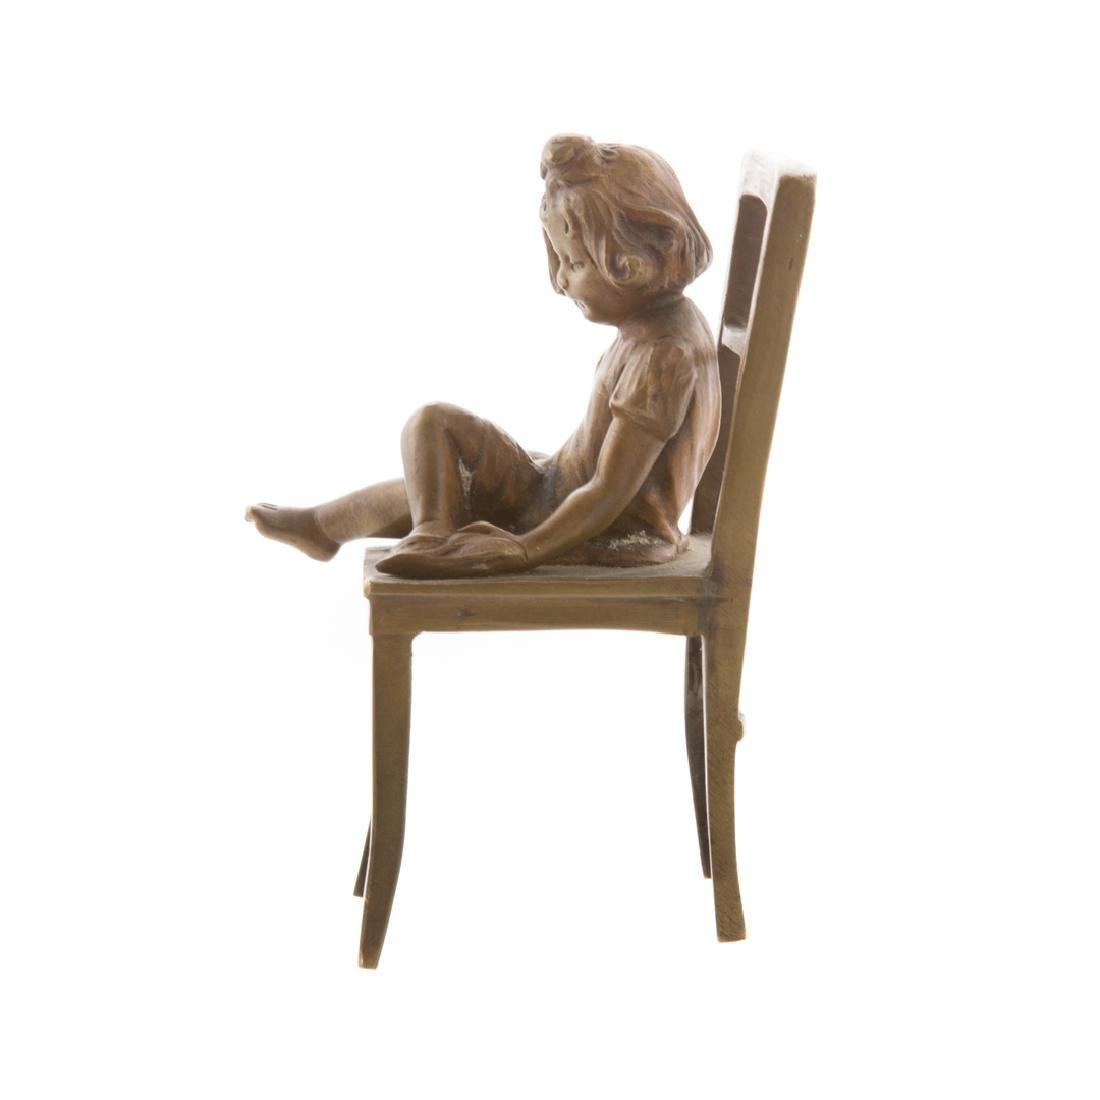 Austrian bronze little girl in chair - 2